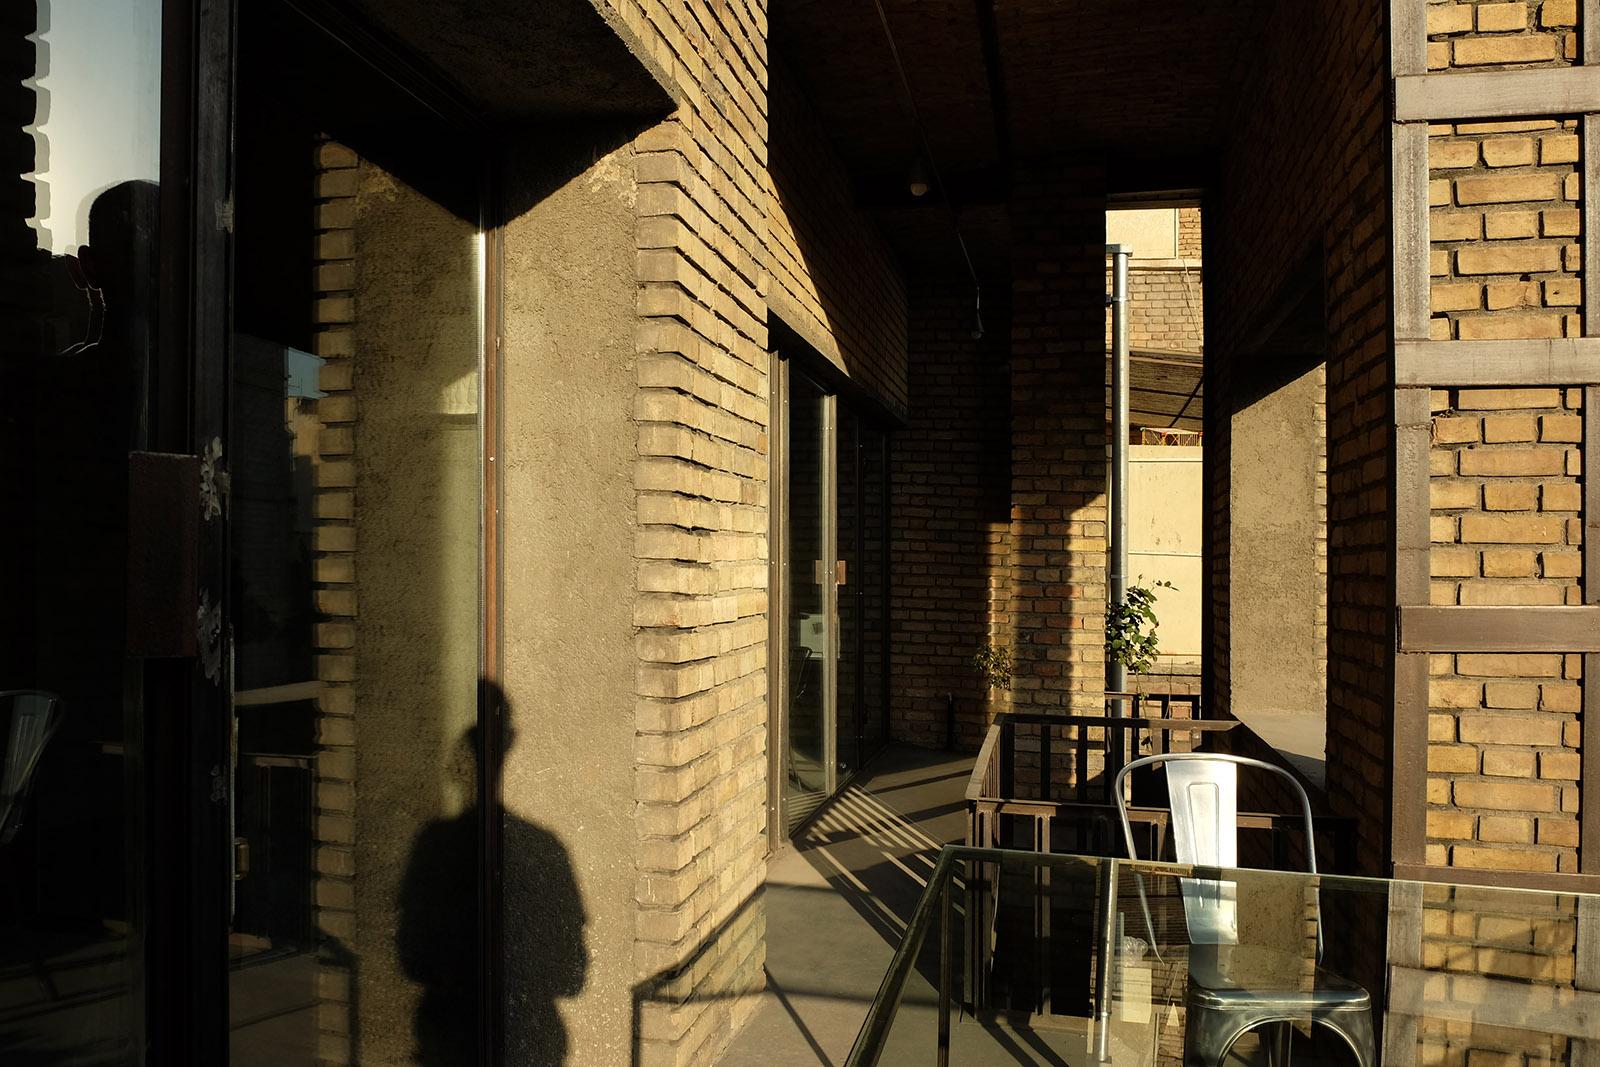 Farsh Film Studio in Tehran, Iran by ZAV Architects